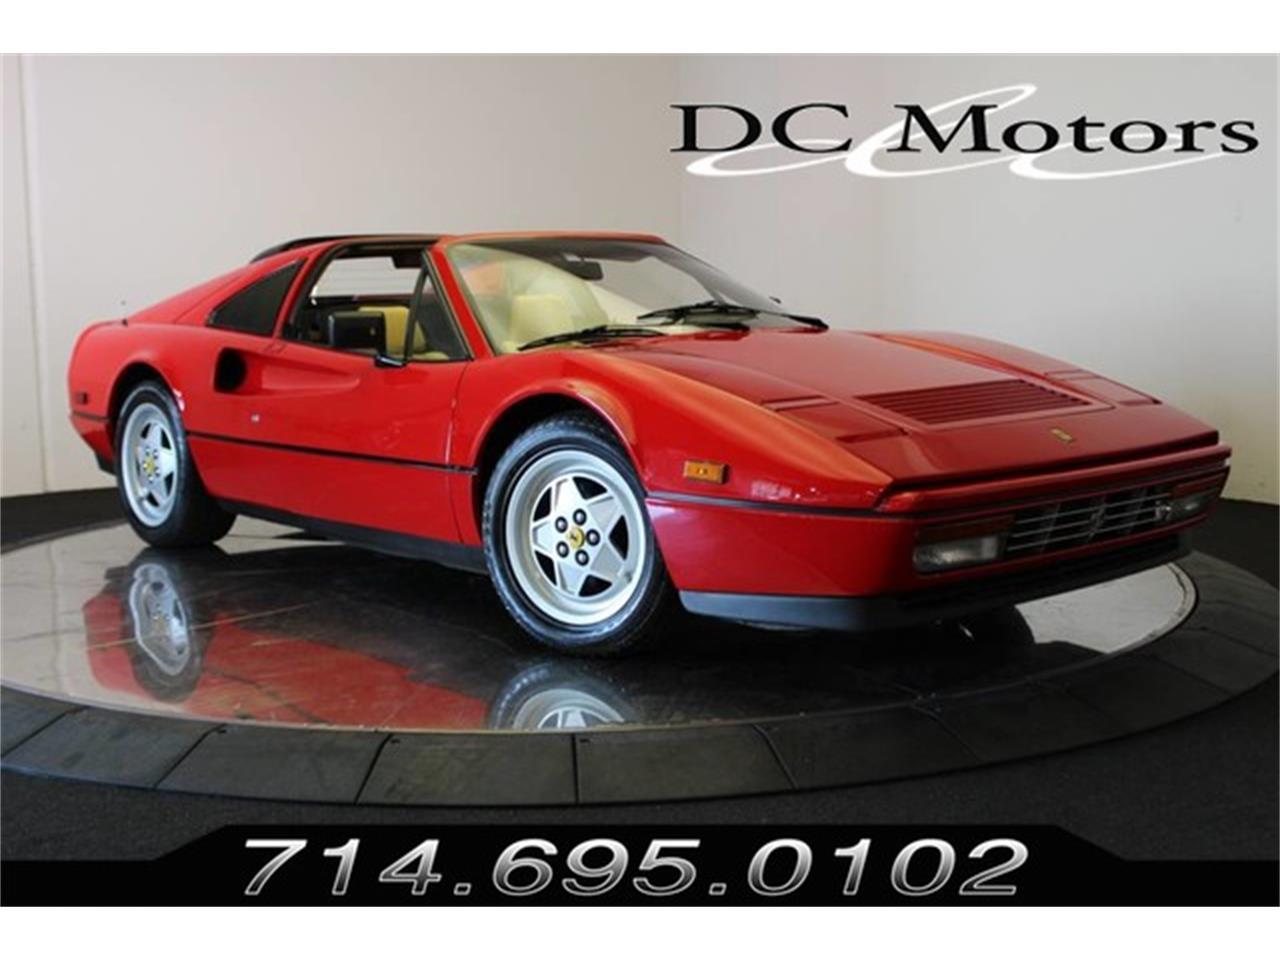 Large Picture of 1989 Ferrari 328 located in Anaheim California - $79,900.00 - K8EK